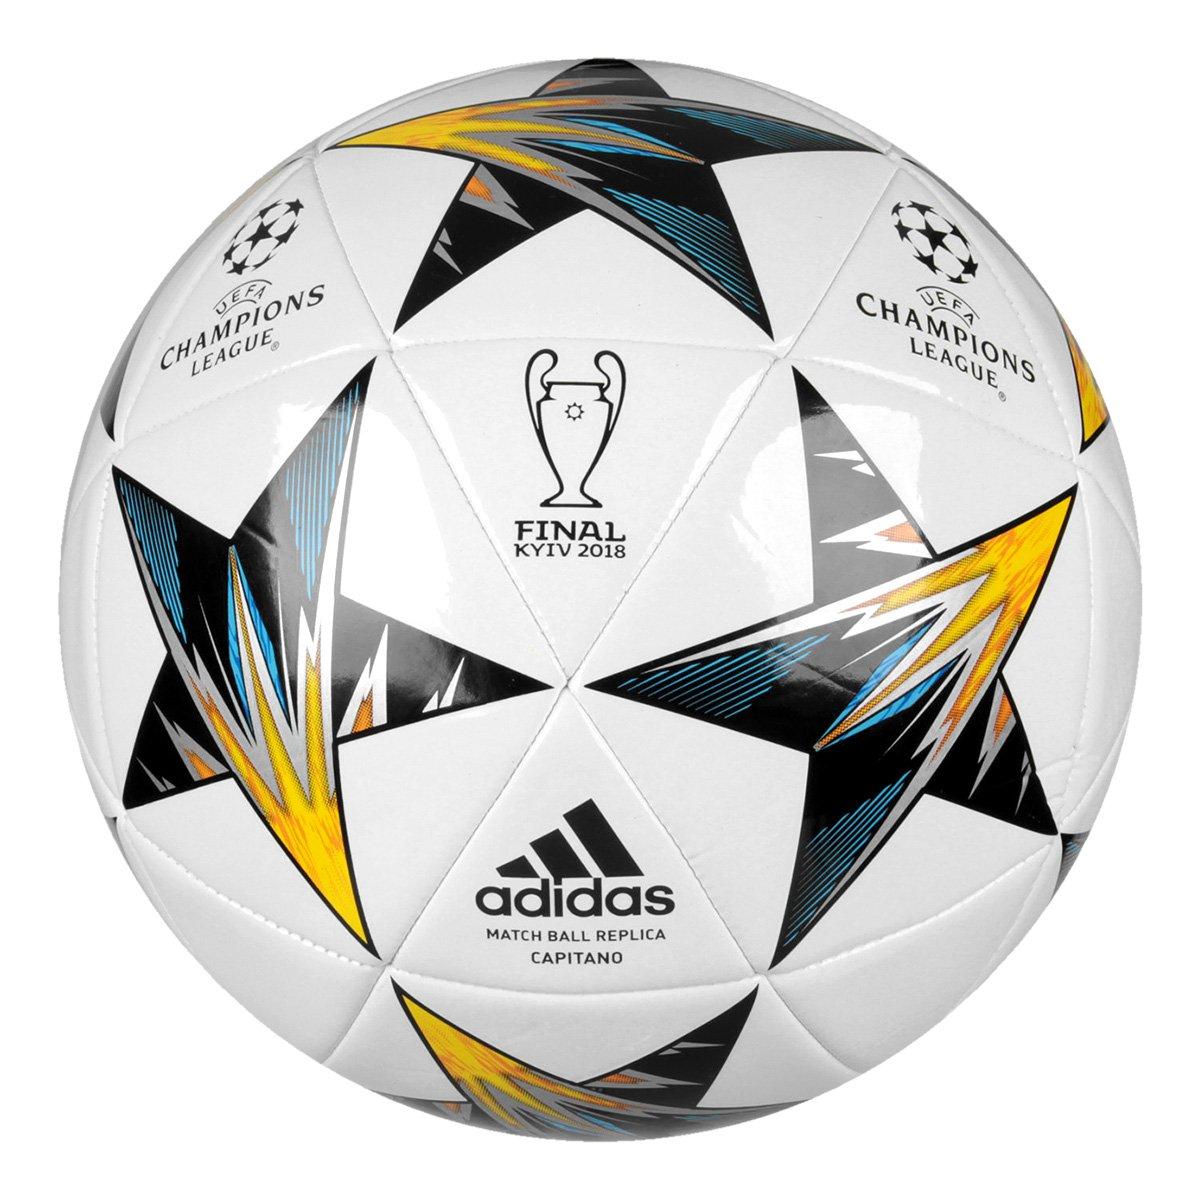 b9ccc7cebff4b Bola Futebol Campo Adidas Finale Kiev Capitano - Compre Agora